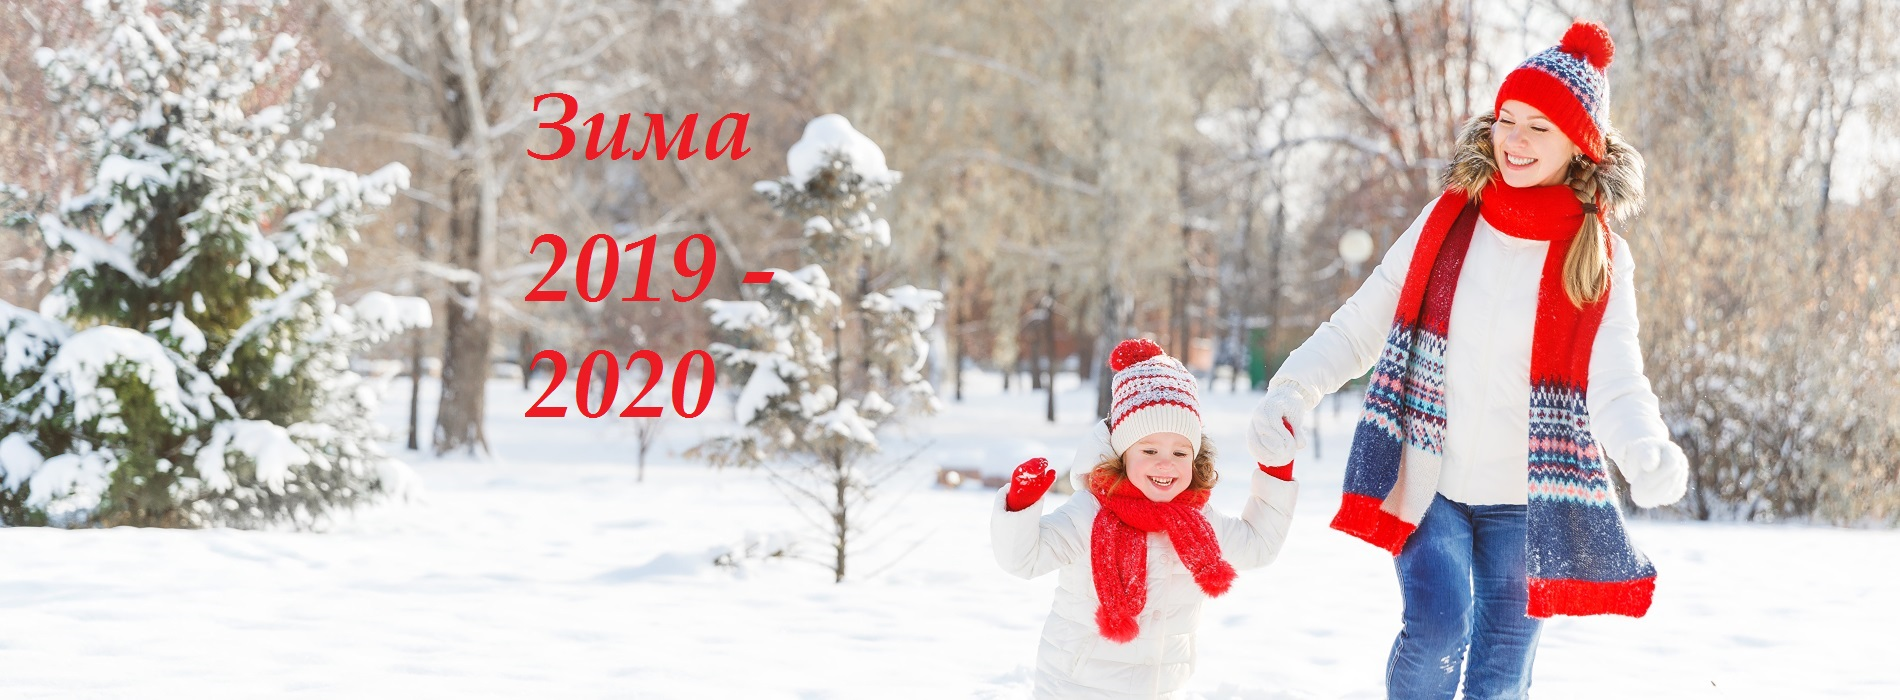 winter_two_snow_little_girls_run_winter_hat_scarf_540921_3840x2160